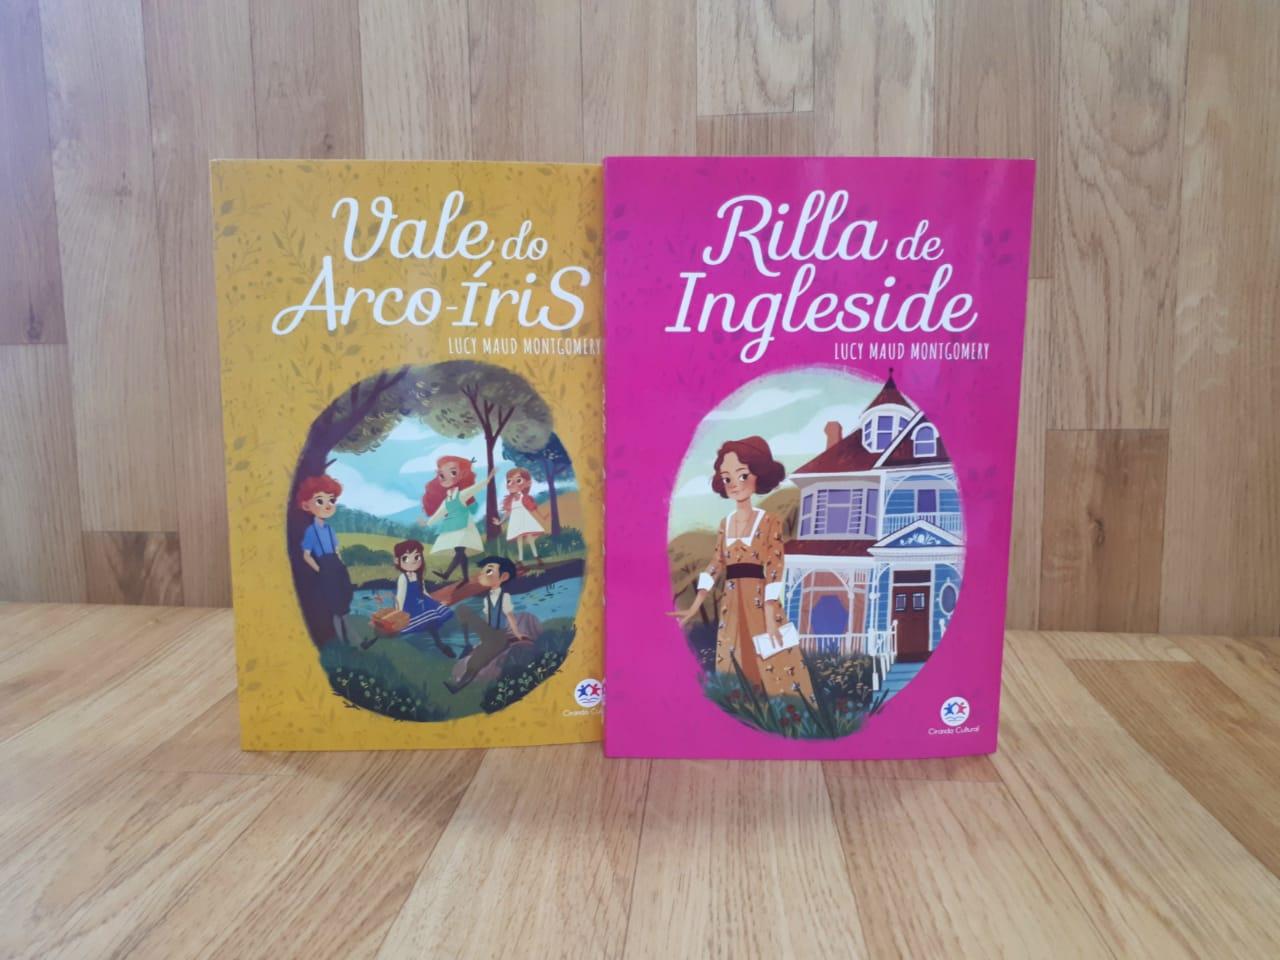 Kit Rilla de Ingleside   Vale do Arco Íris